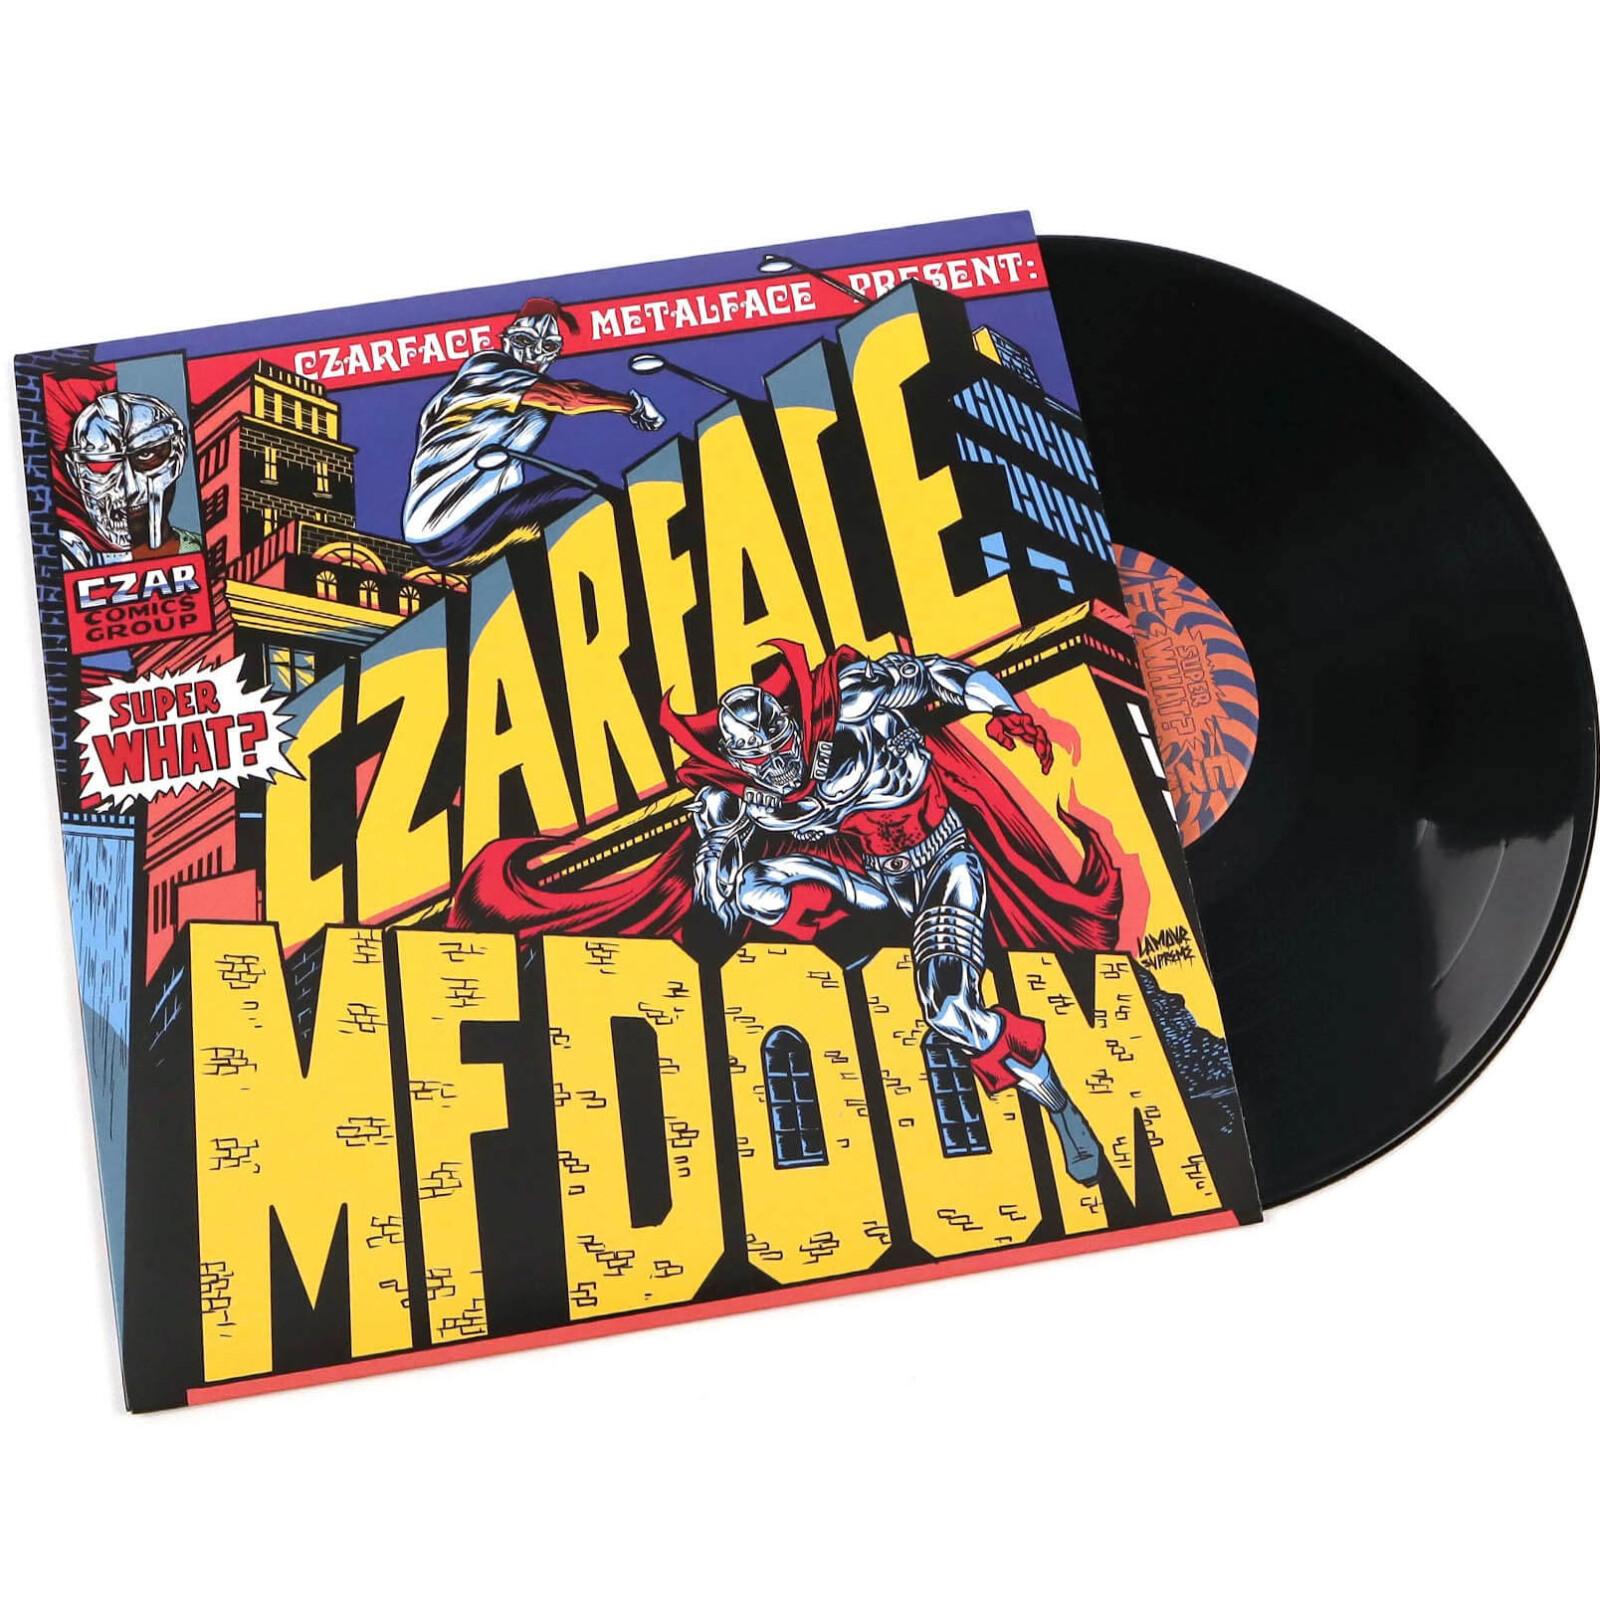 czarface mf doom super what vinyl lp